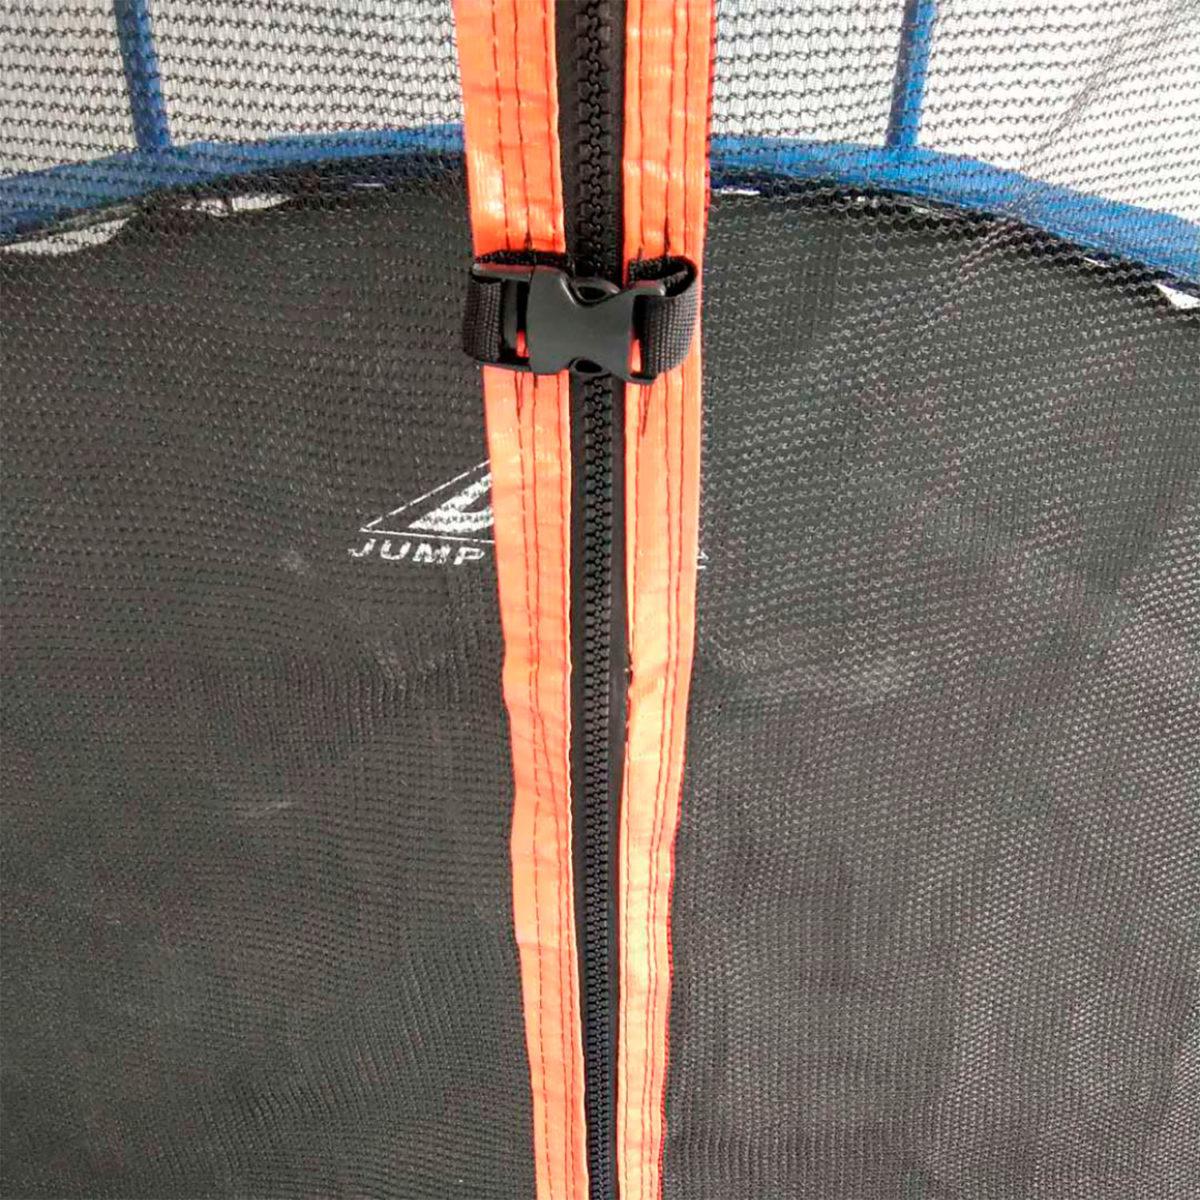 DFC Батут DFC JUMP BASKET с внутр. сеткой, лестница (244 см) - 3